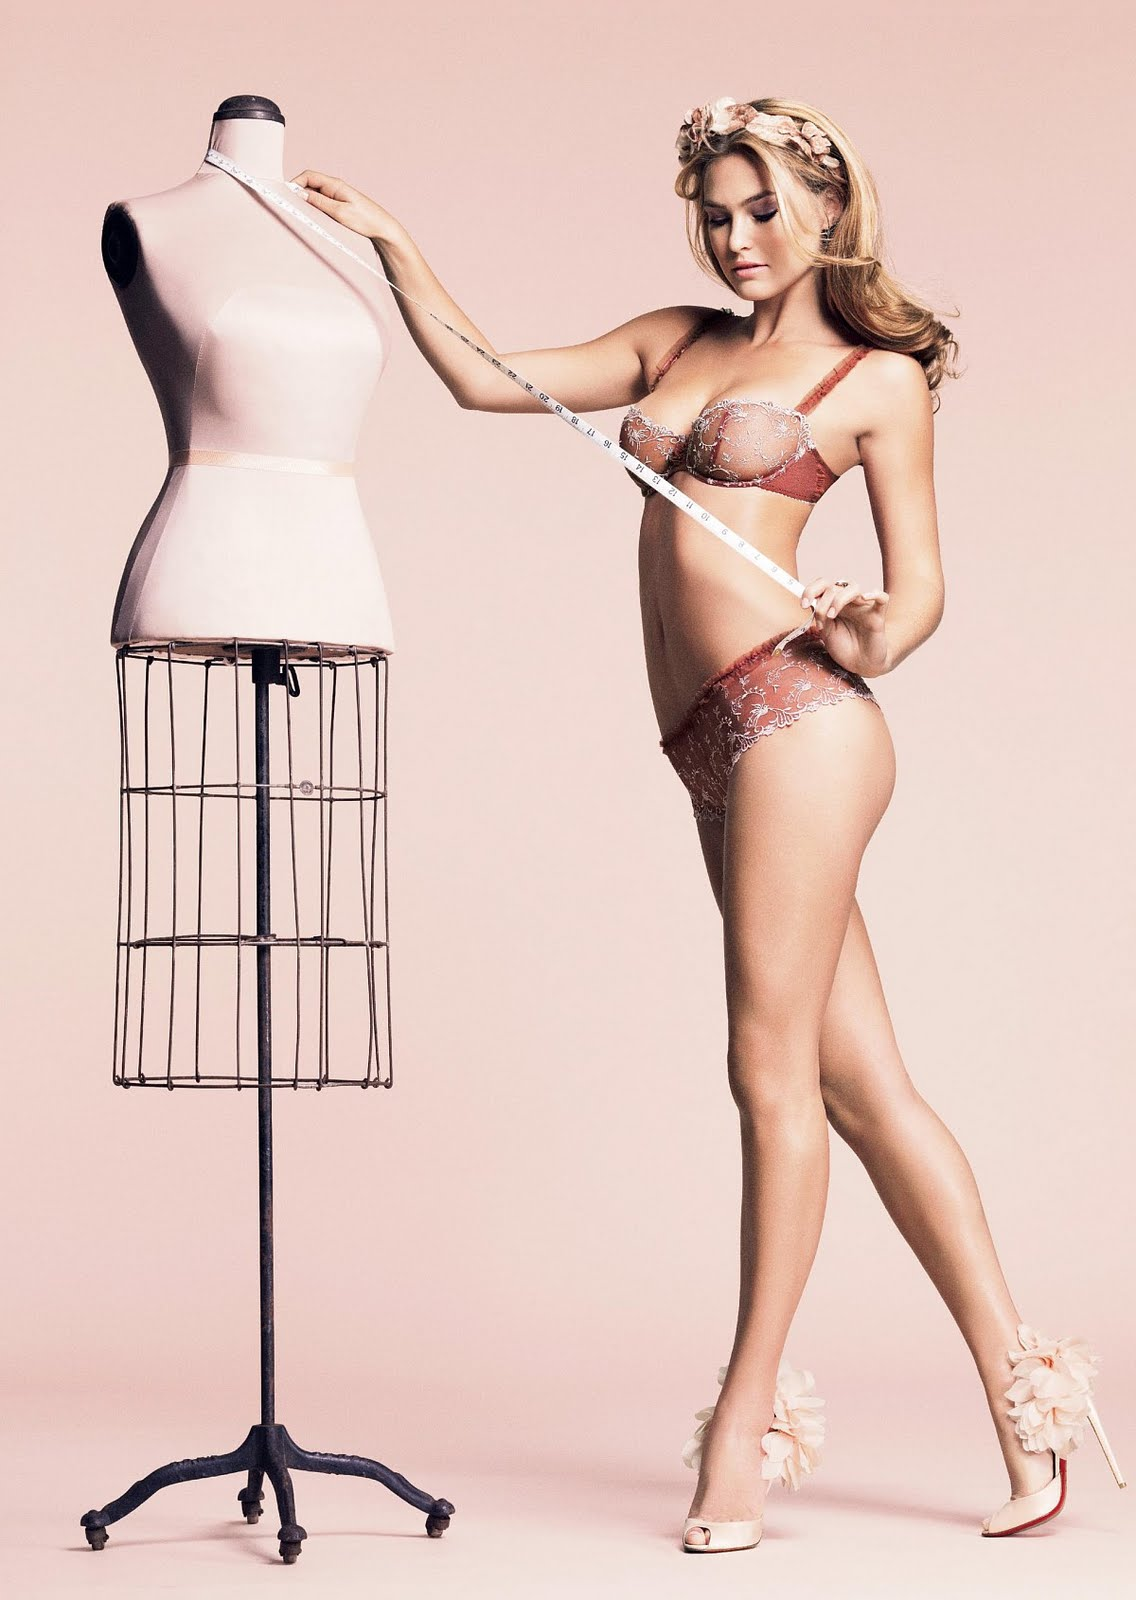 http://1.bp.blogspot.com/_jx-KCnvjTuI/S6ubX_doCOI/AAAAAAAAUwc/SZwcCo0Zpsw/s1600/bar-refaeli-lingerie-passionata-07.jpg